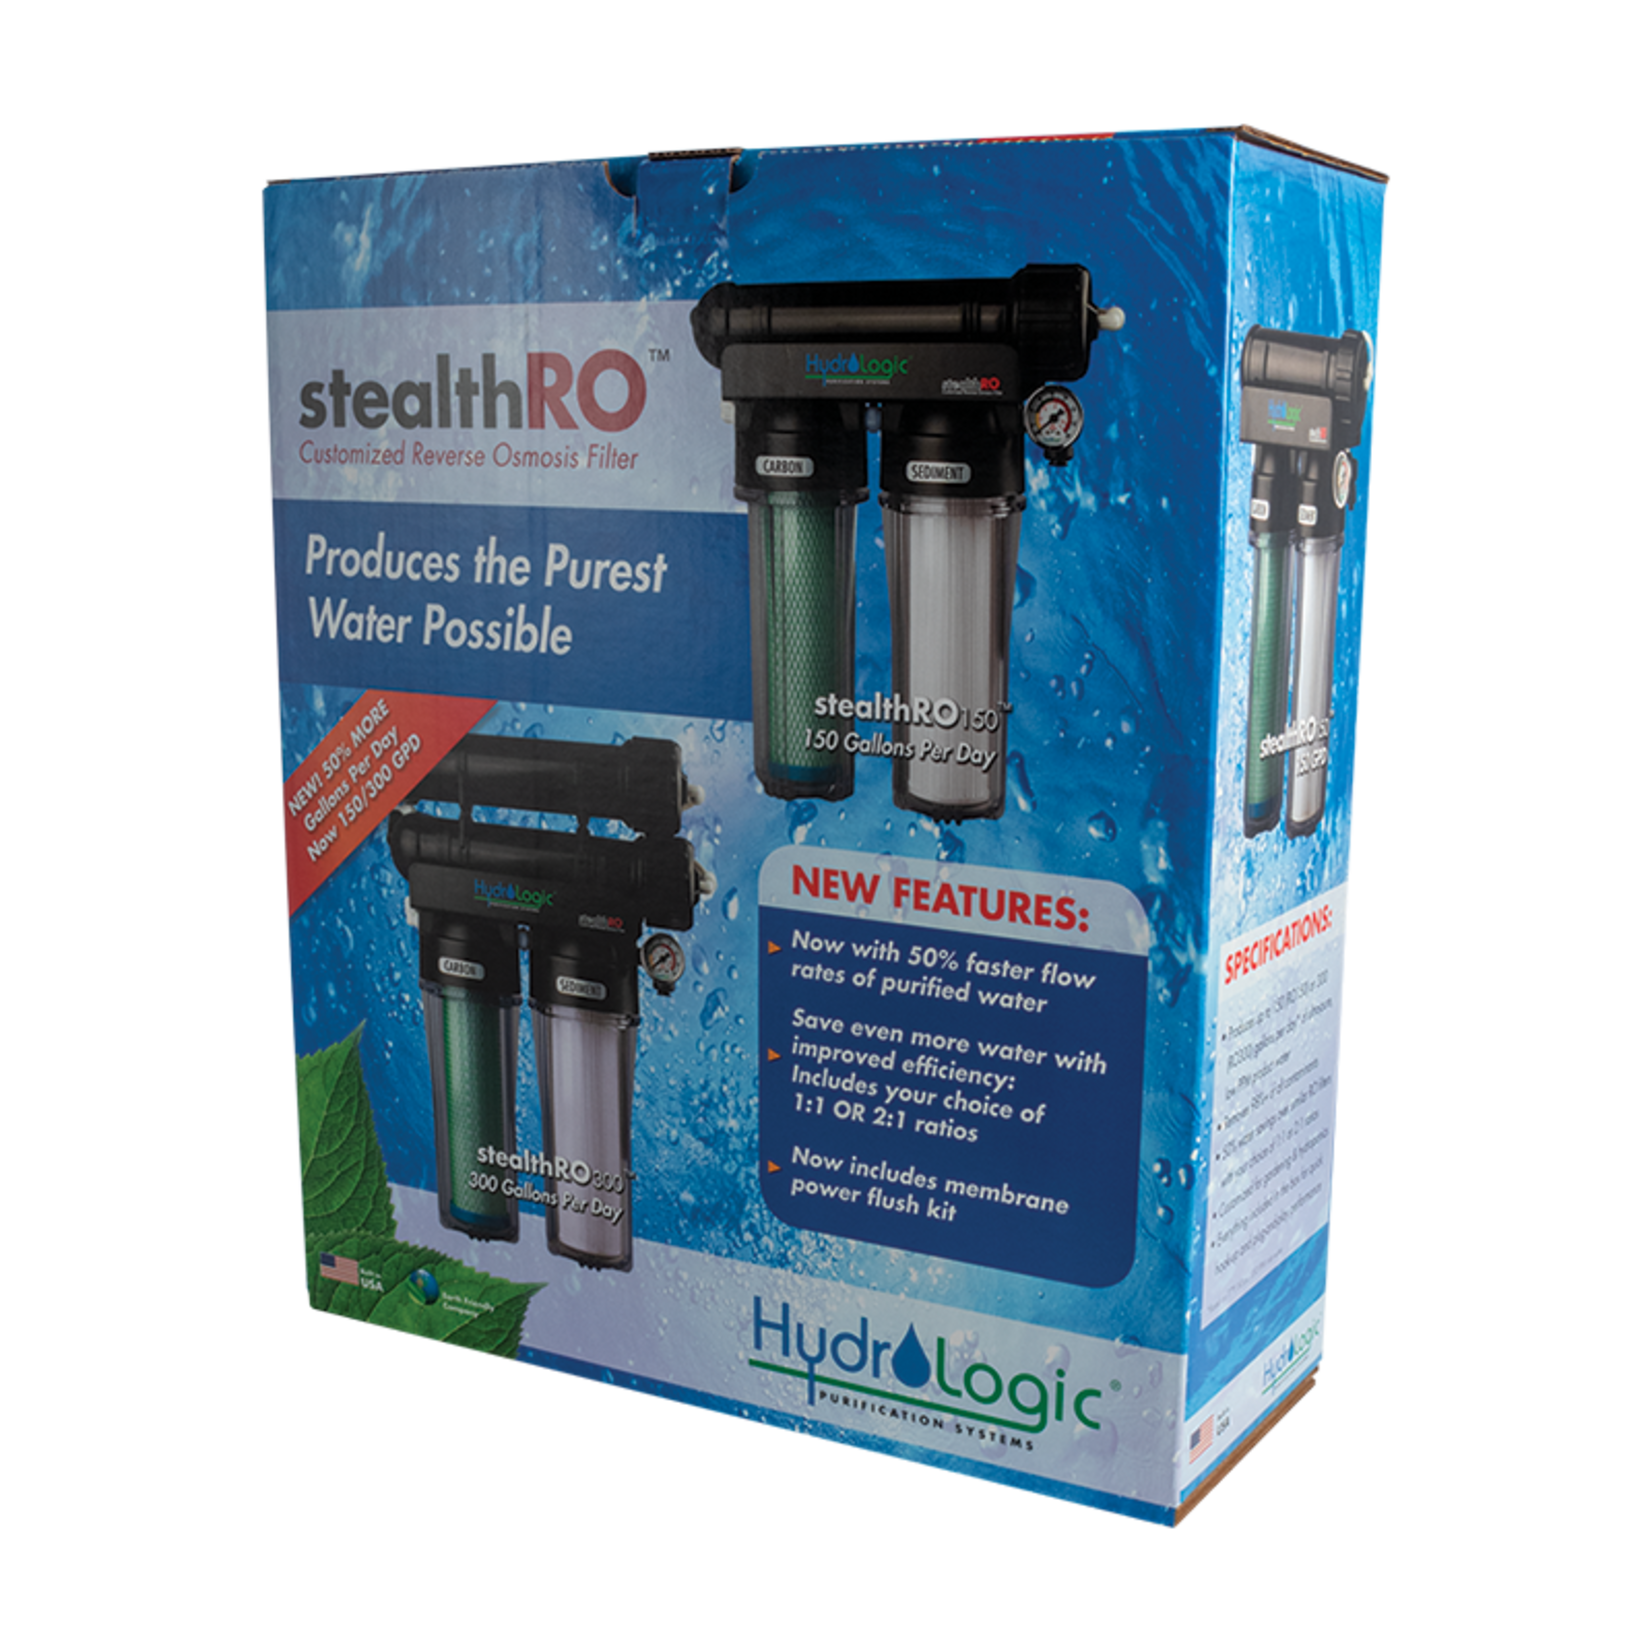 Hydrologic HYDROLOGIC STEALTH-RO300 GPD REVERSE OSMOSIS